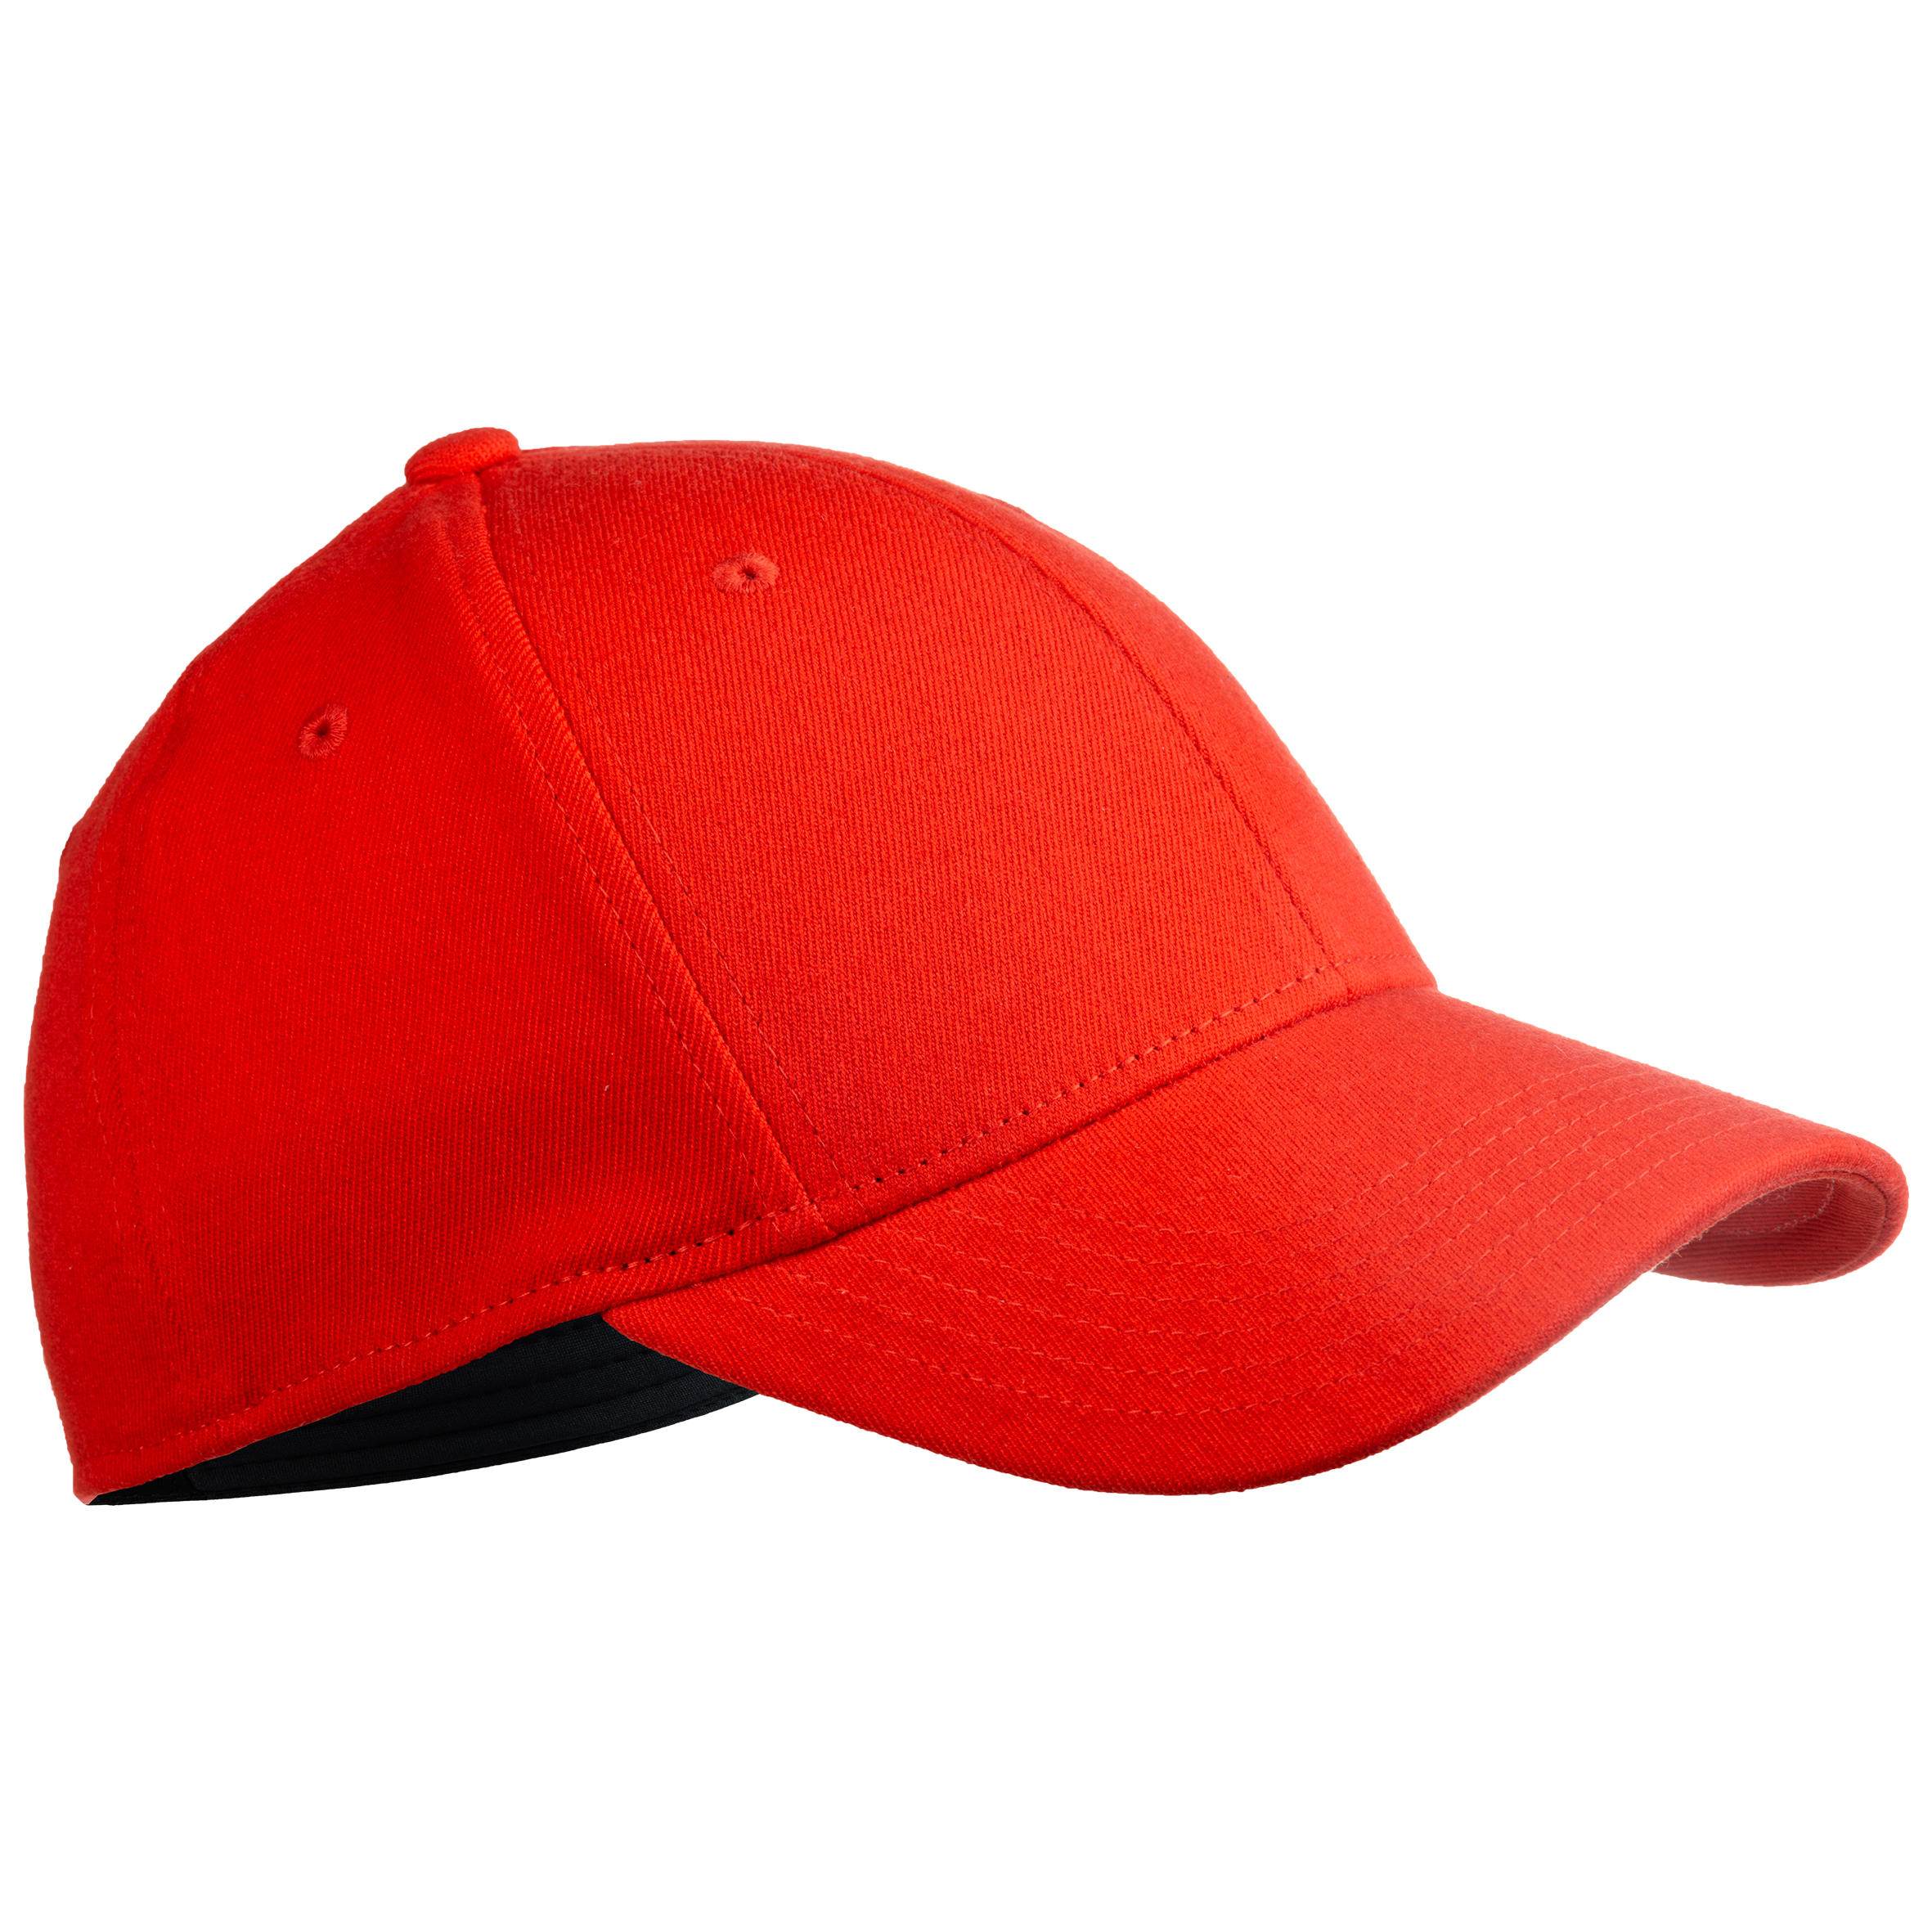 Șapcă Baseball BA550 Roșu imagine